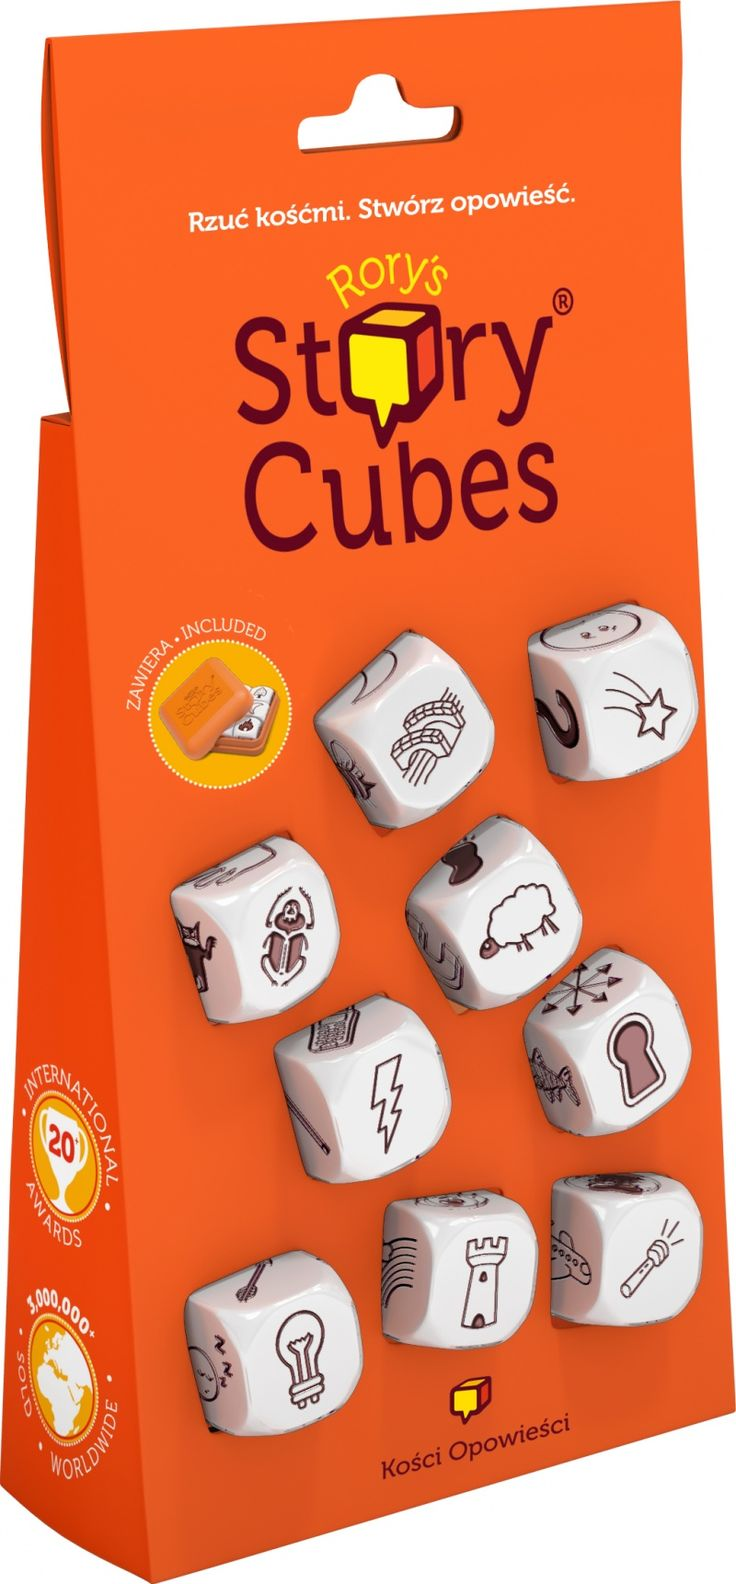 Story Cubes: Kompakt Gra